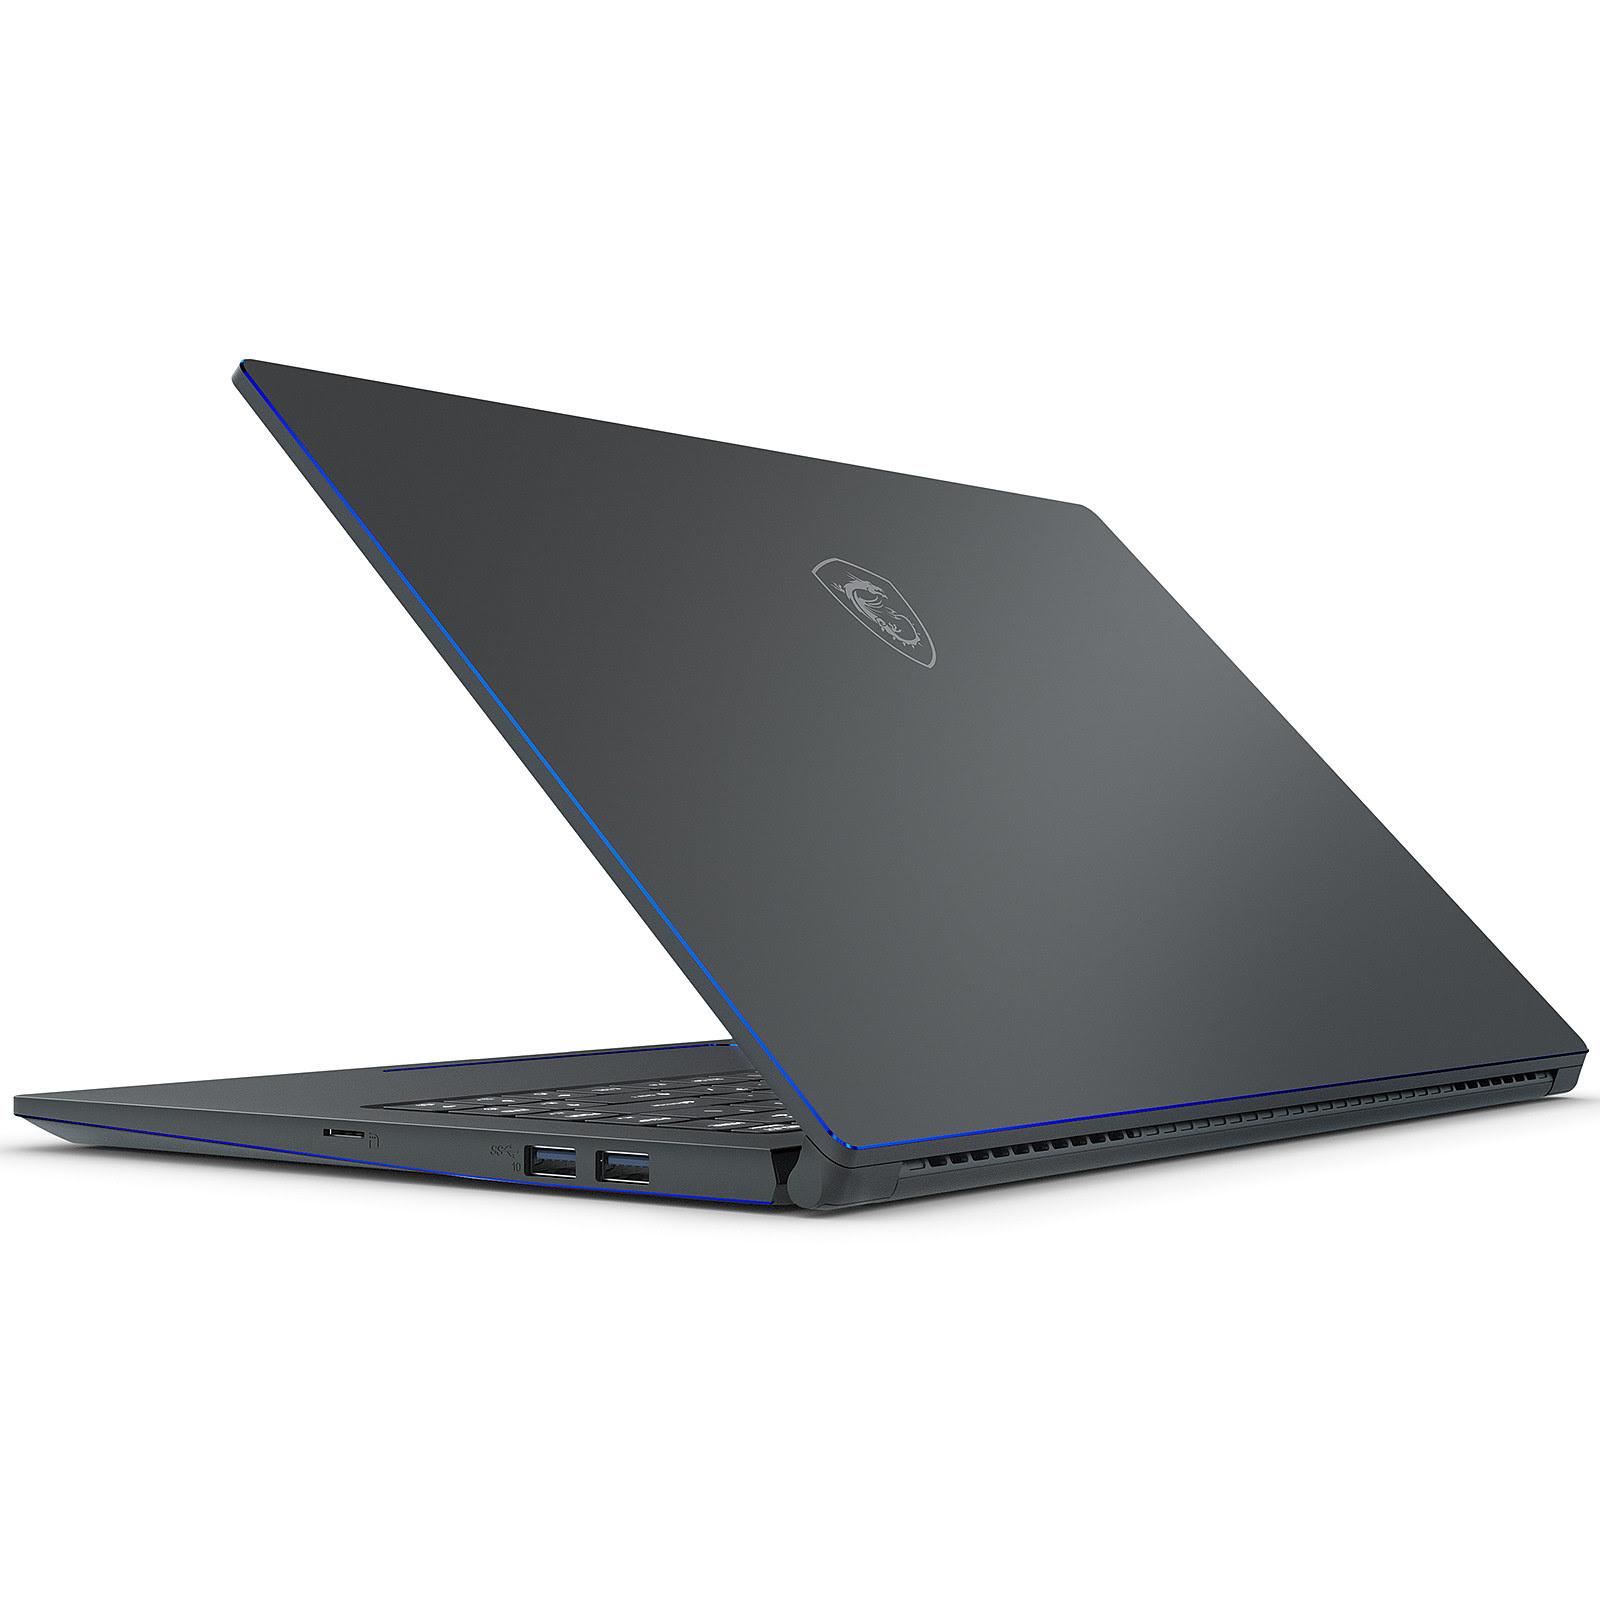 MSI PS63 Modern 8MO-201XFR (9S7-16S211-201) - Achat / Vente PC portable sur Cybertek.fr - 1